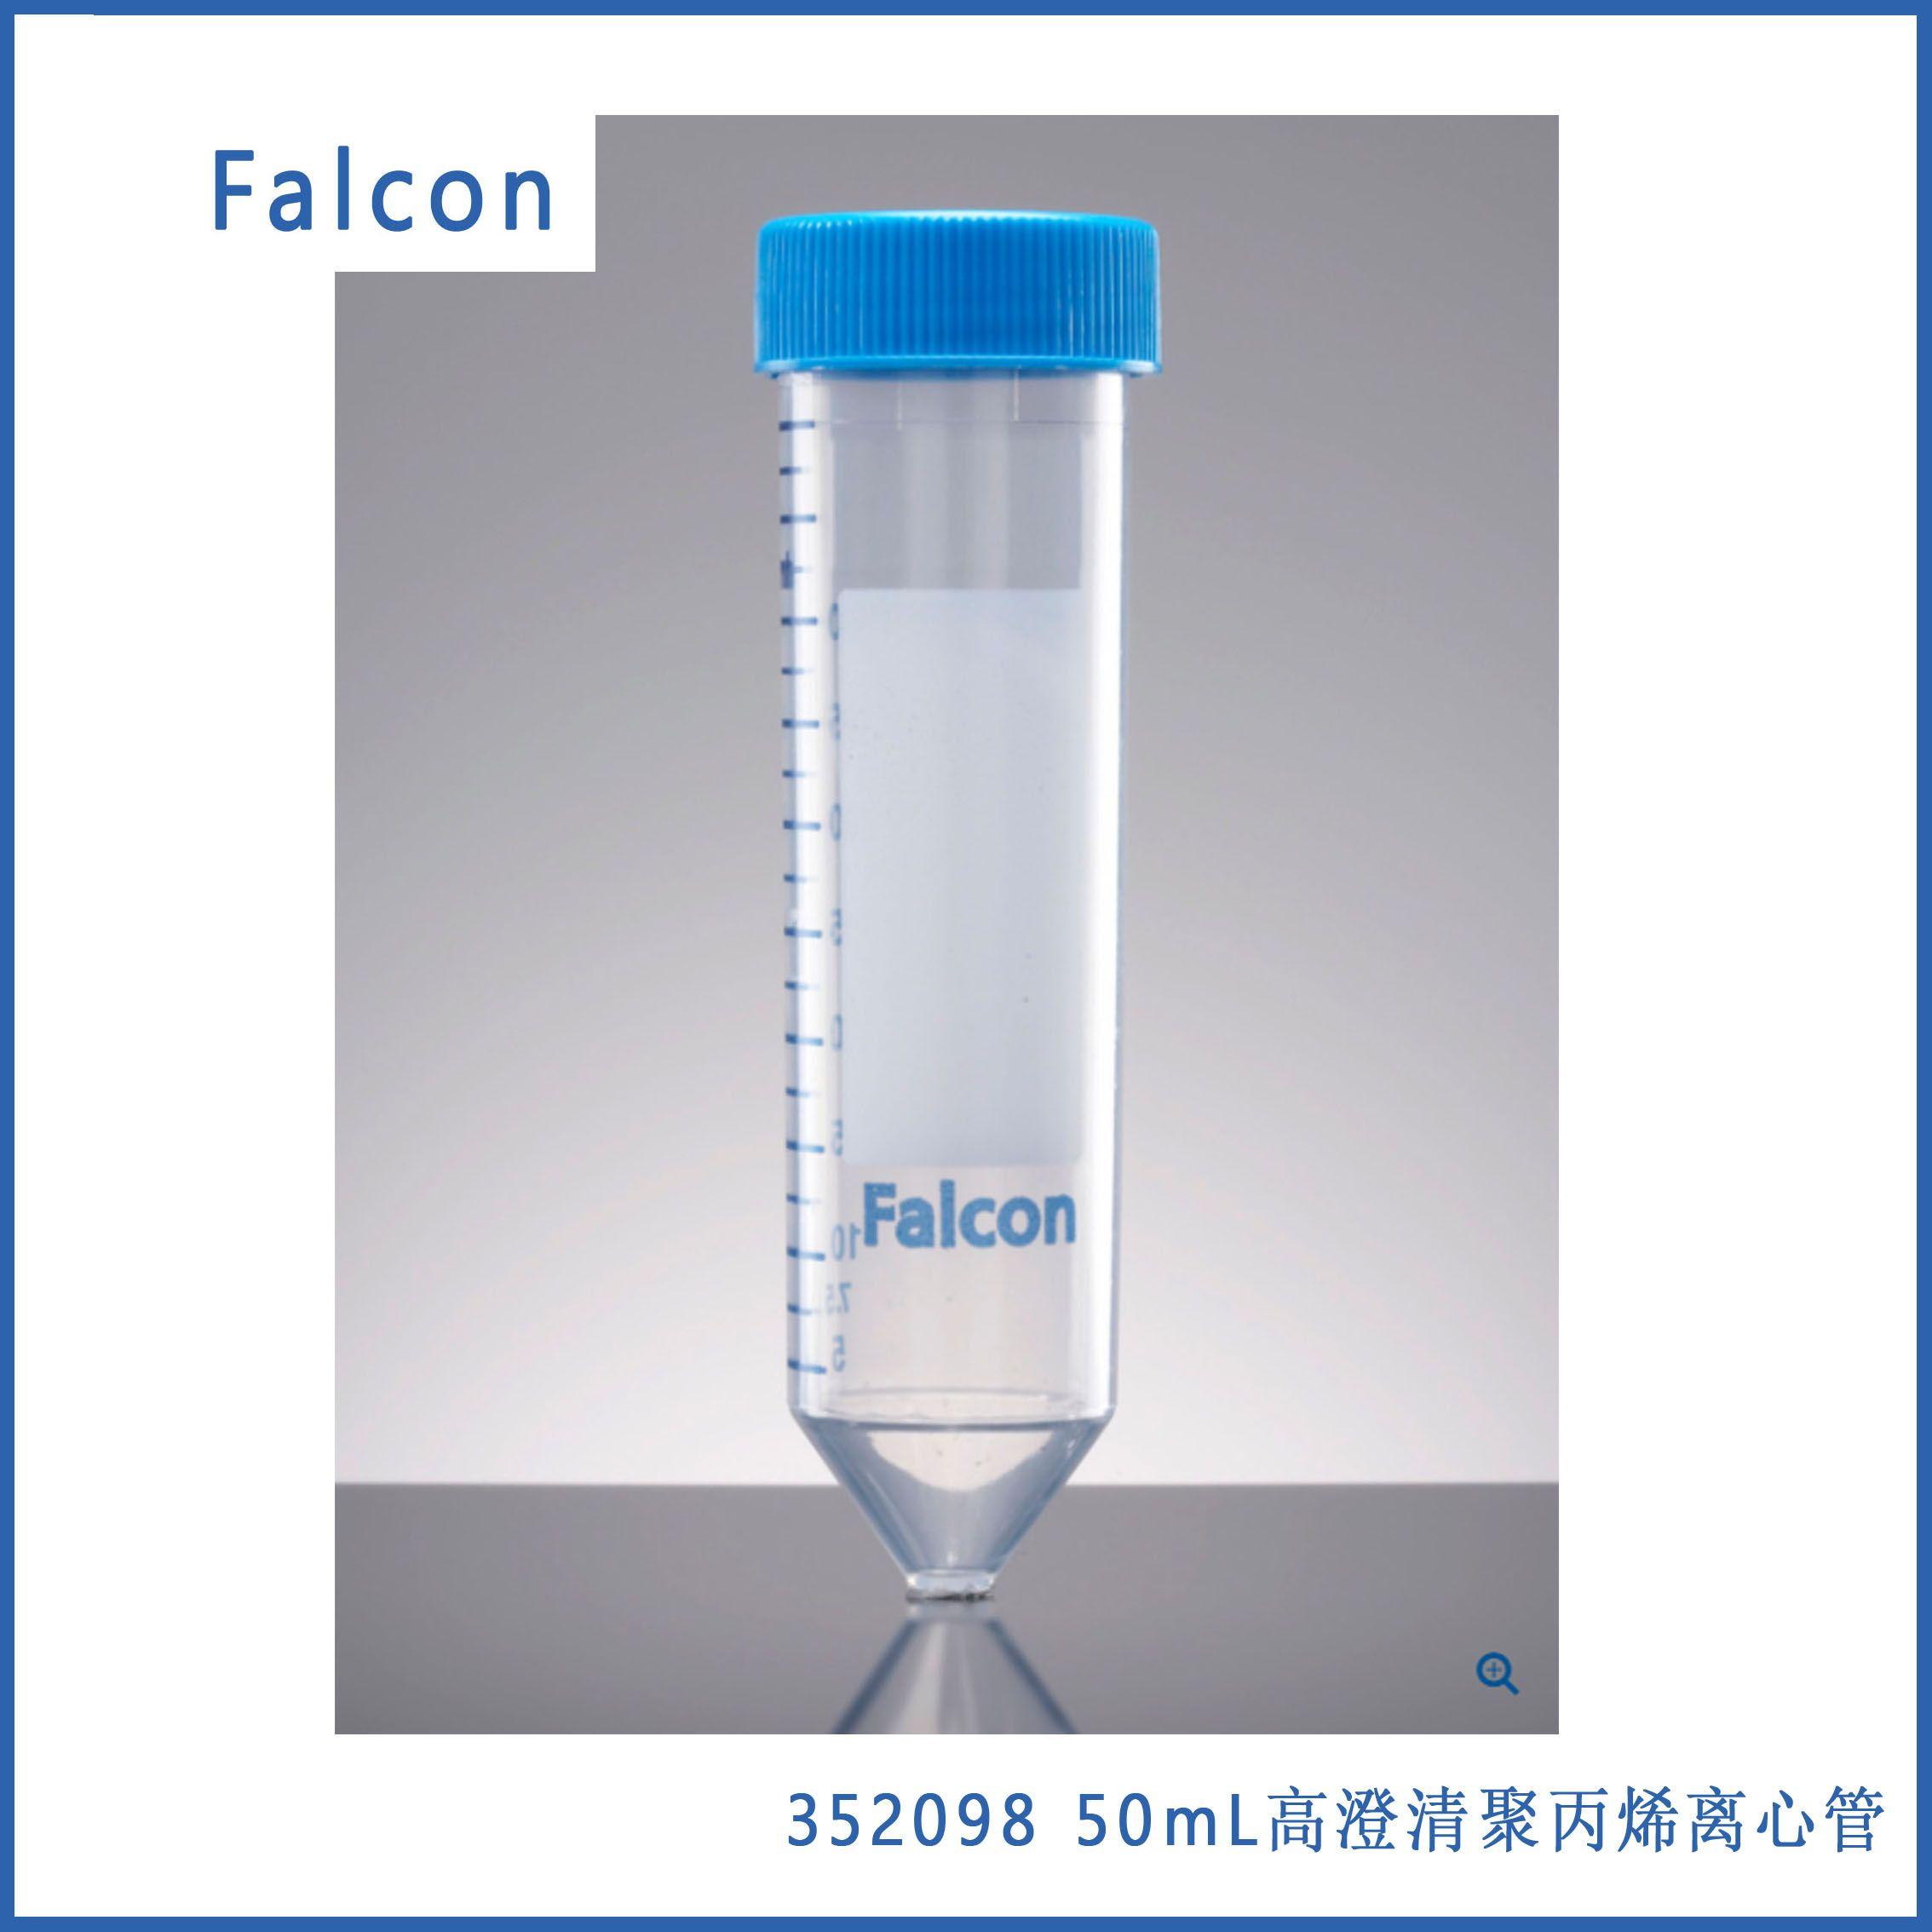 Falcon 352098 50mL高澄清聚丙烯离心管,锥形底,无菌,25/架,500/箱,现货